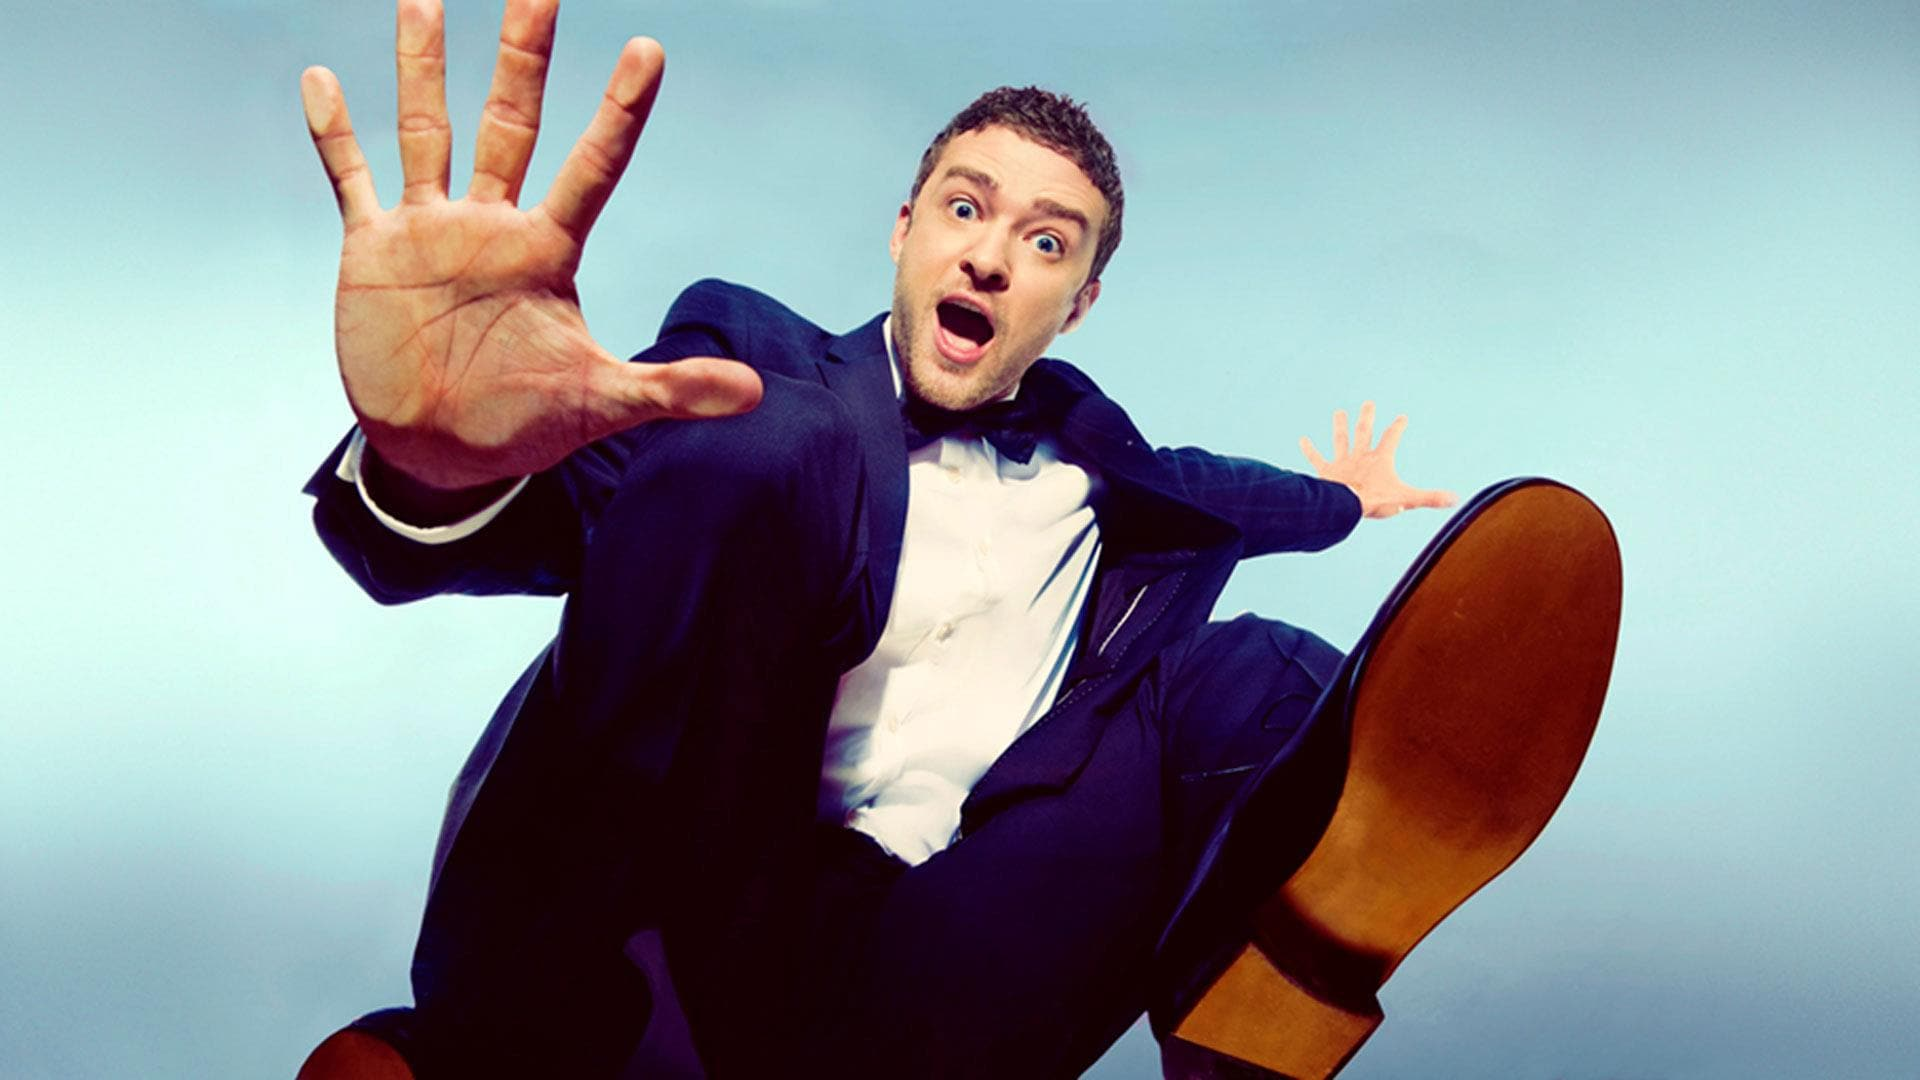 Justin Timberlake: May 9, 2009